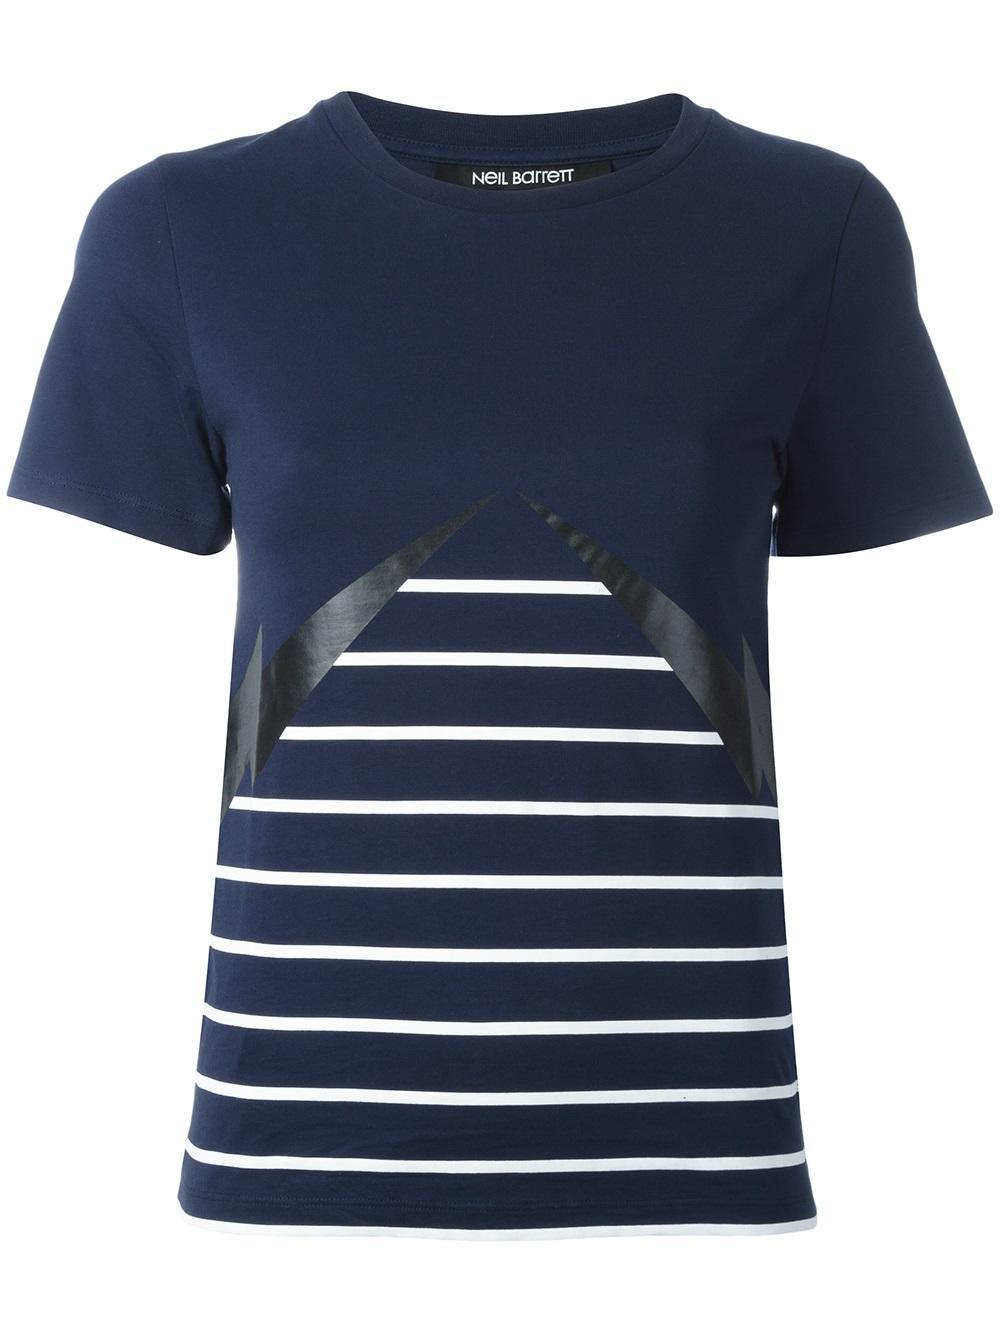 Neil Barrett Lightning Bolt Striped T Shirt In Blue Lyst